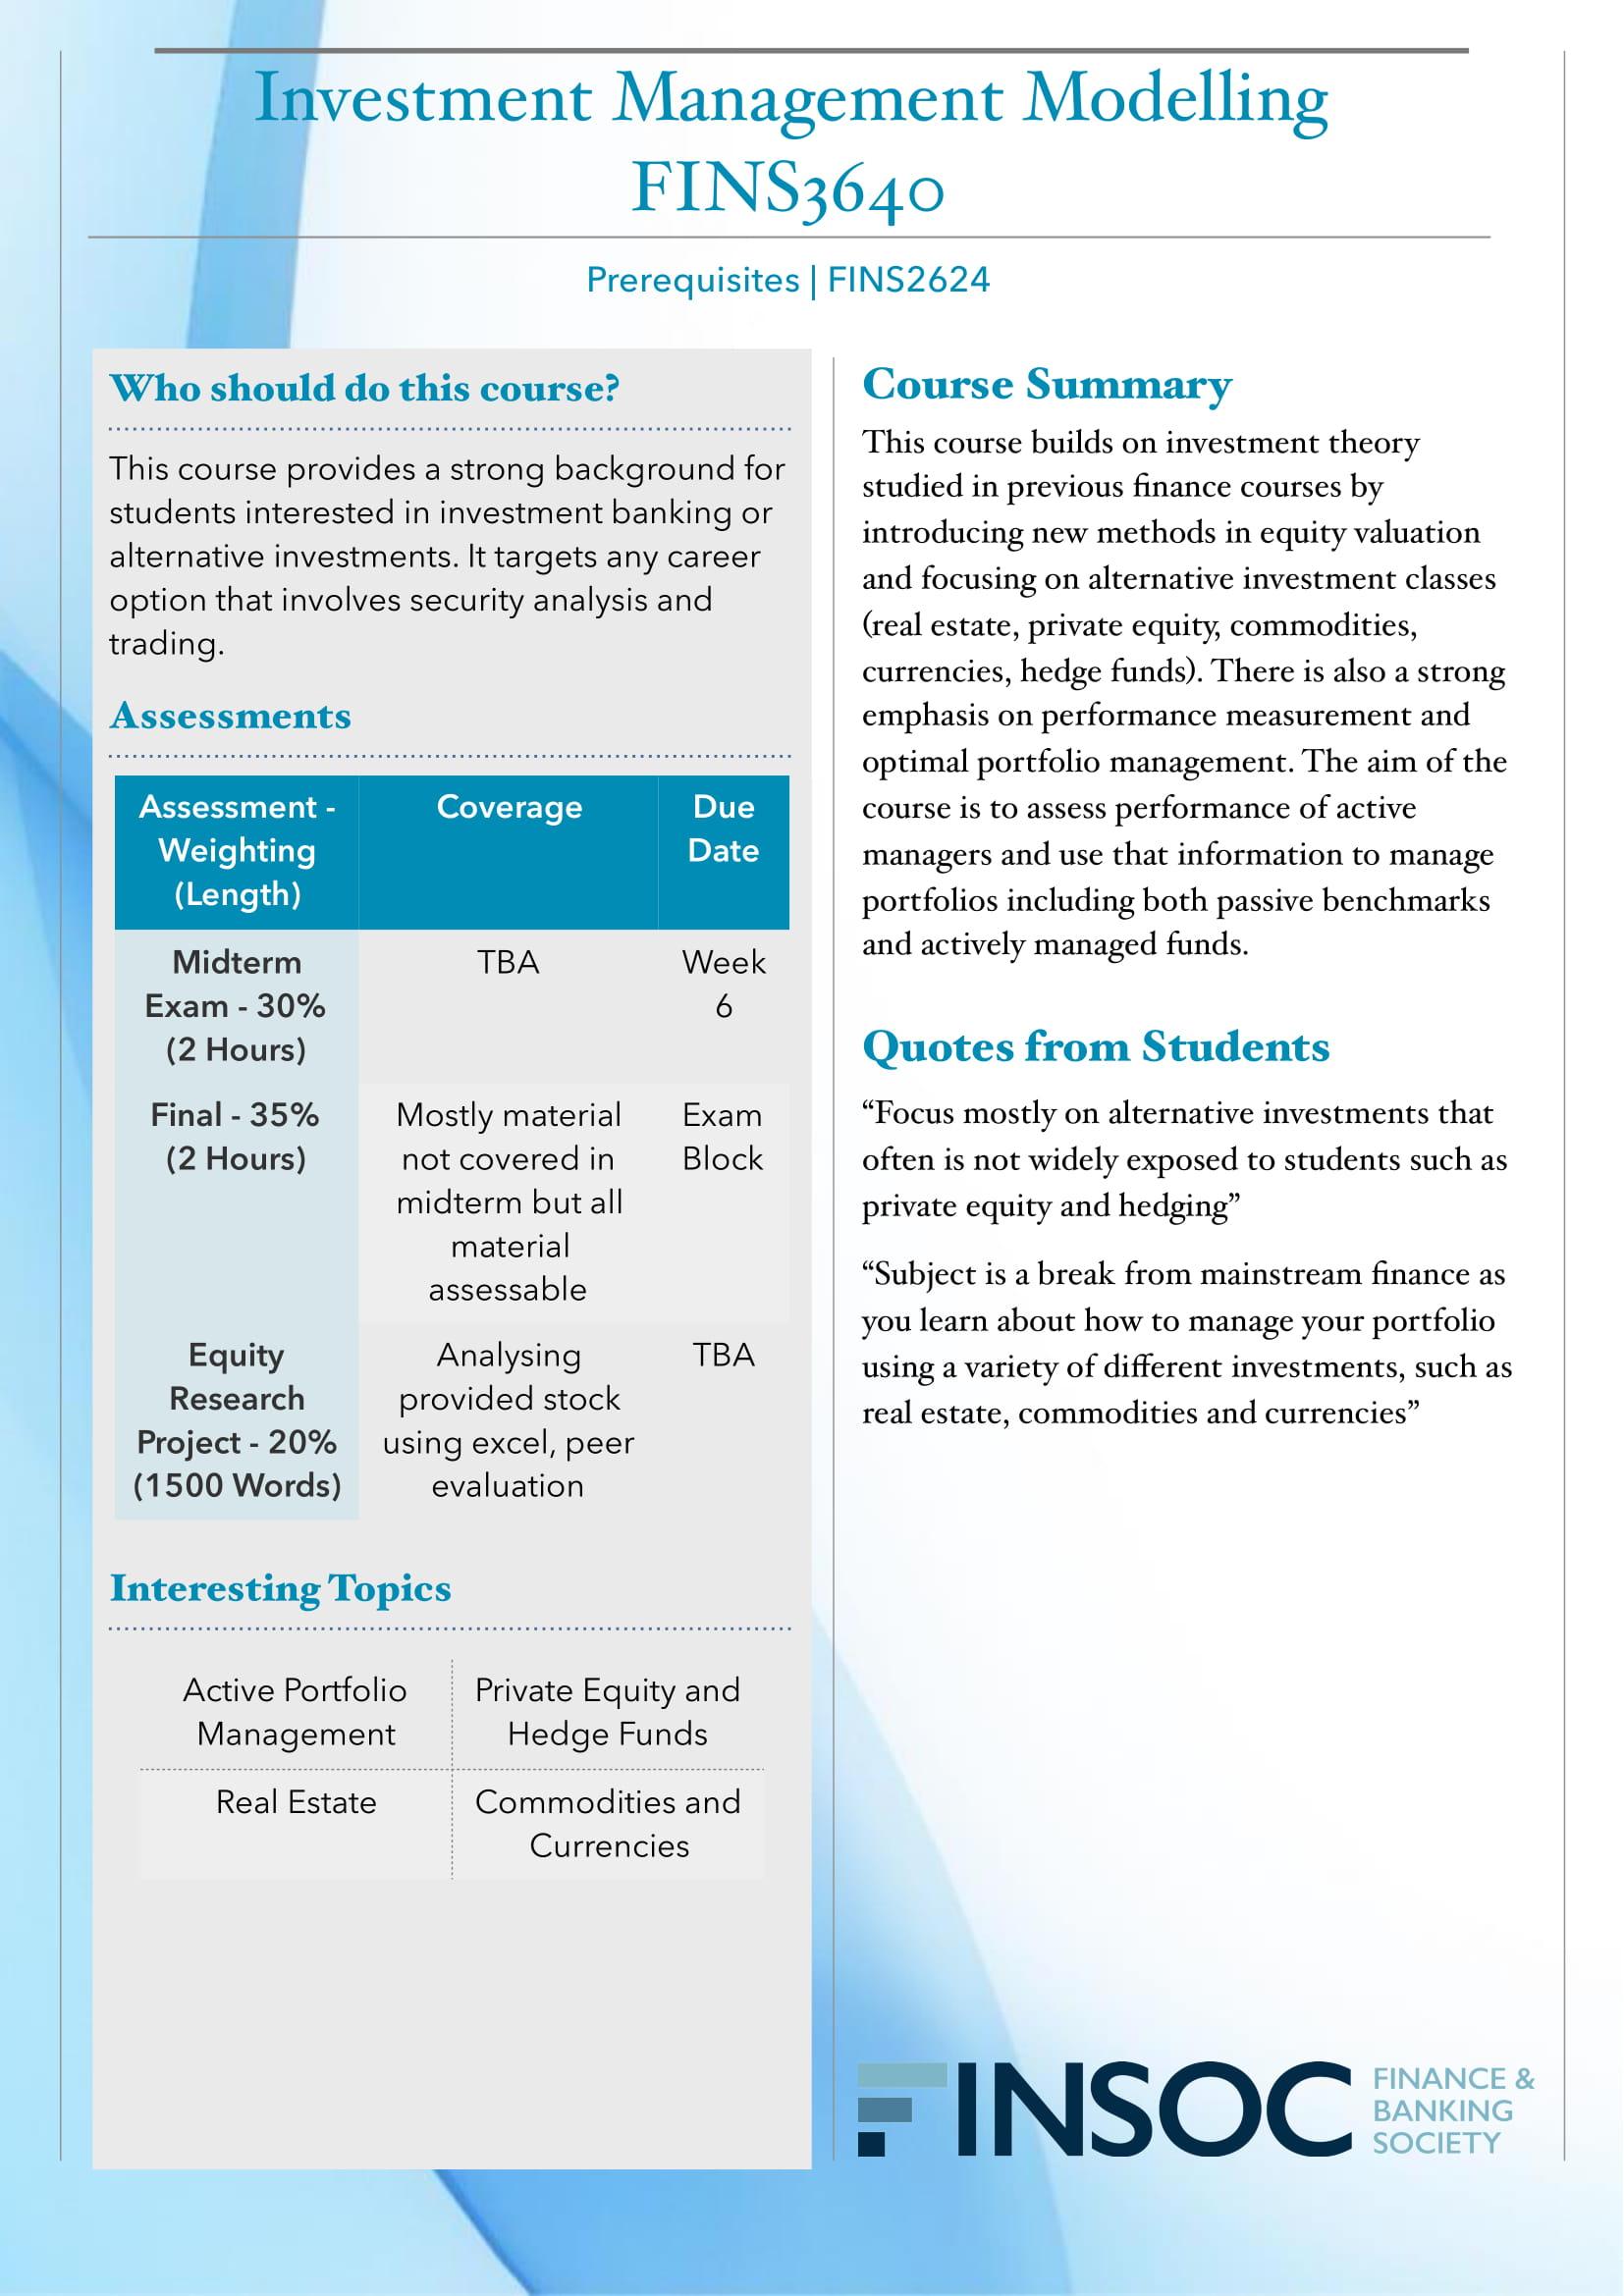 FINS3640 Investment Management Modellingimage preview for post